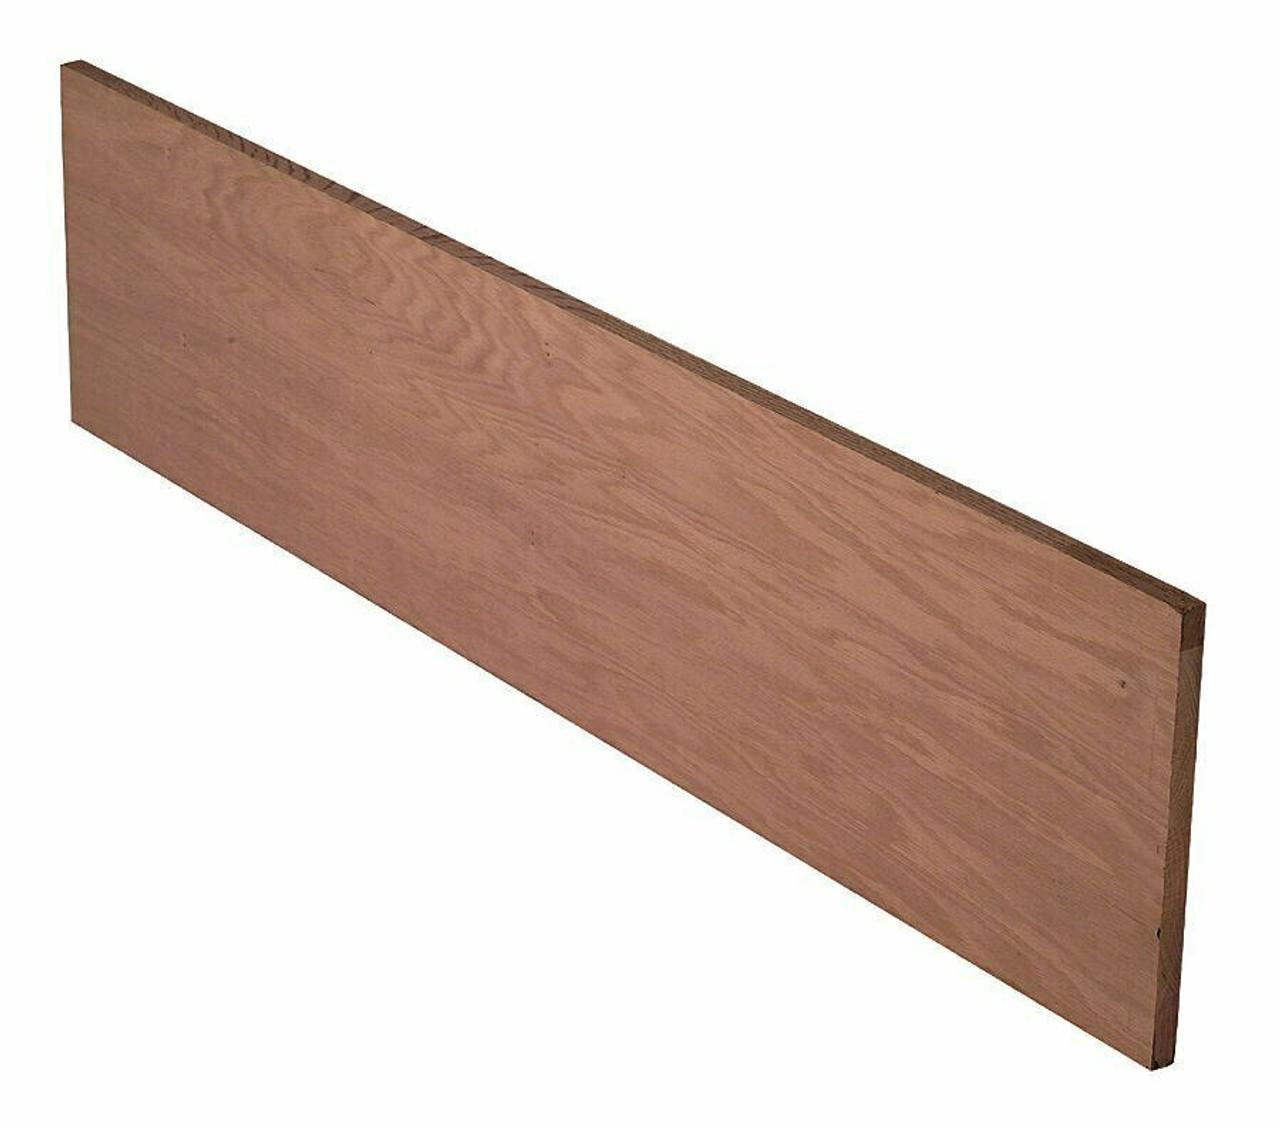 8075 Poplar Stair Riser